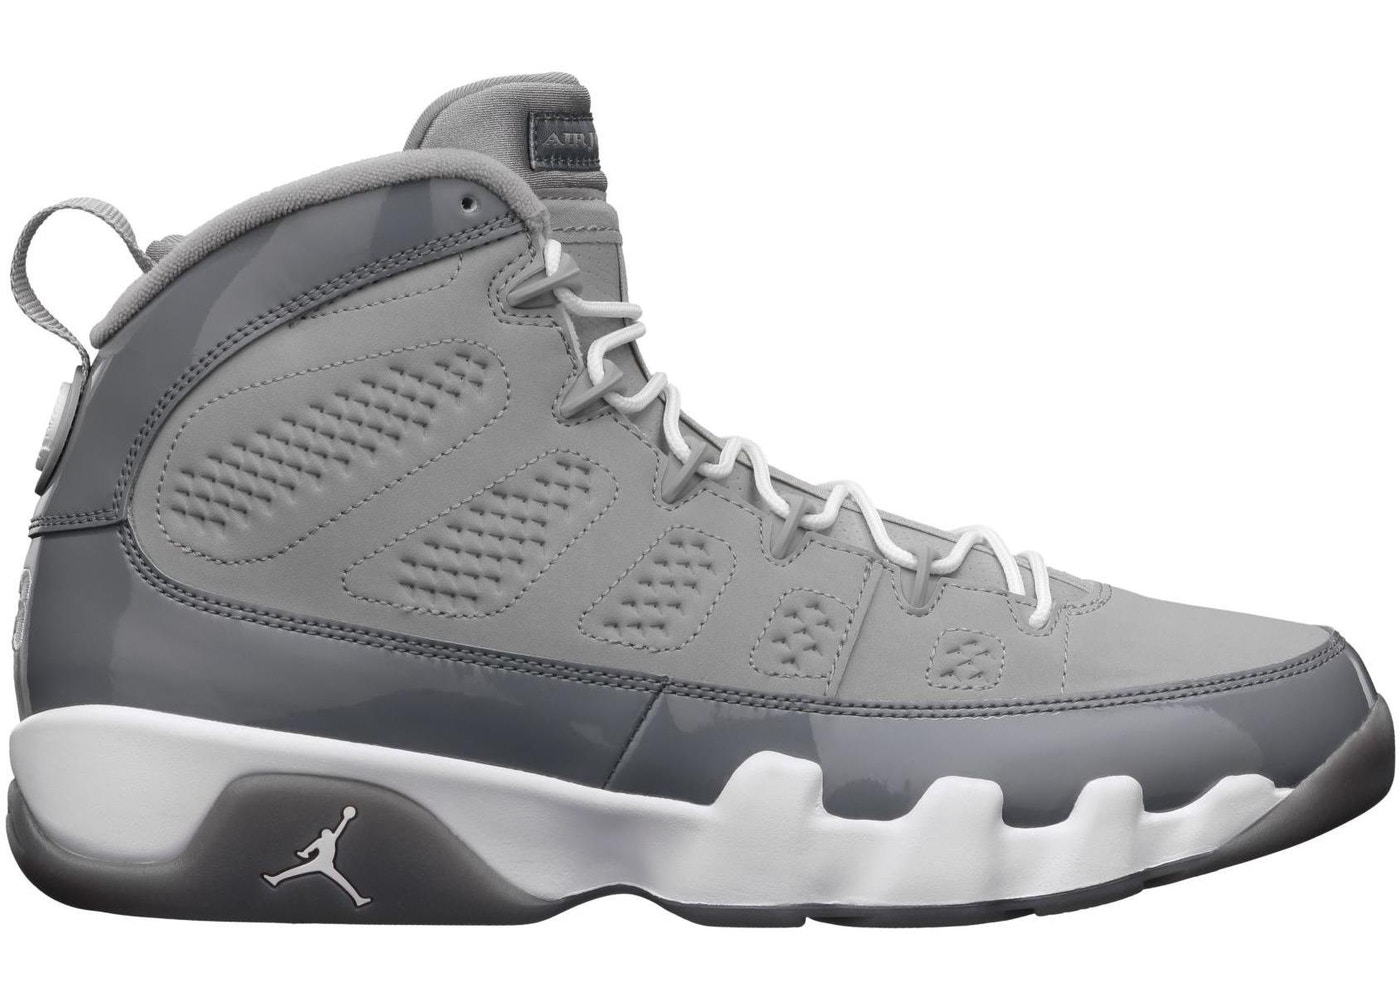 check out abbaf 0b3fa Air Jordan Shoes - Release Date